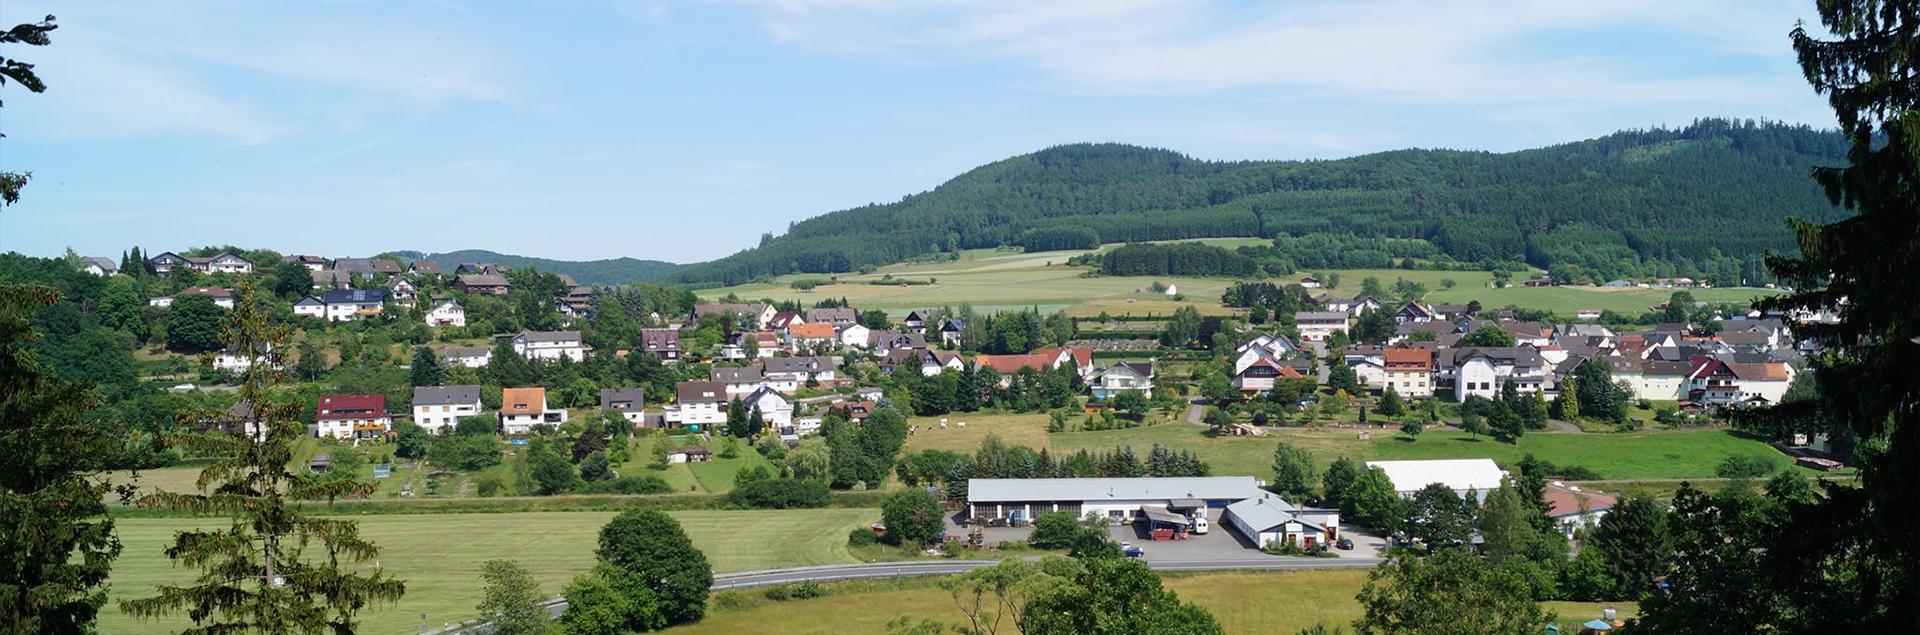 Blick auf Reddighausen